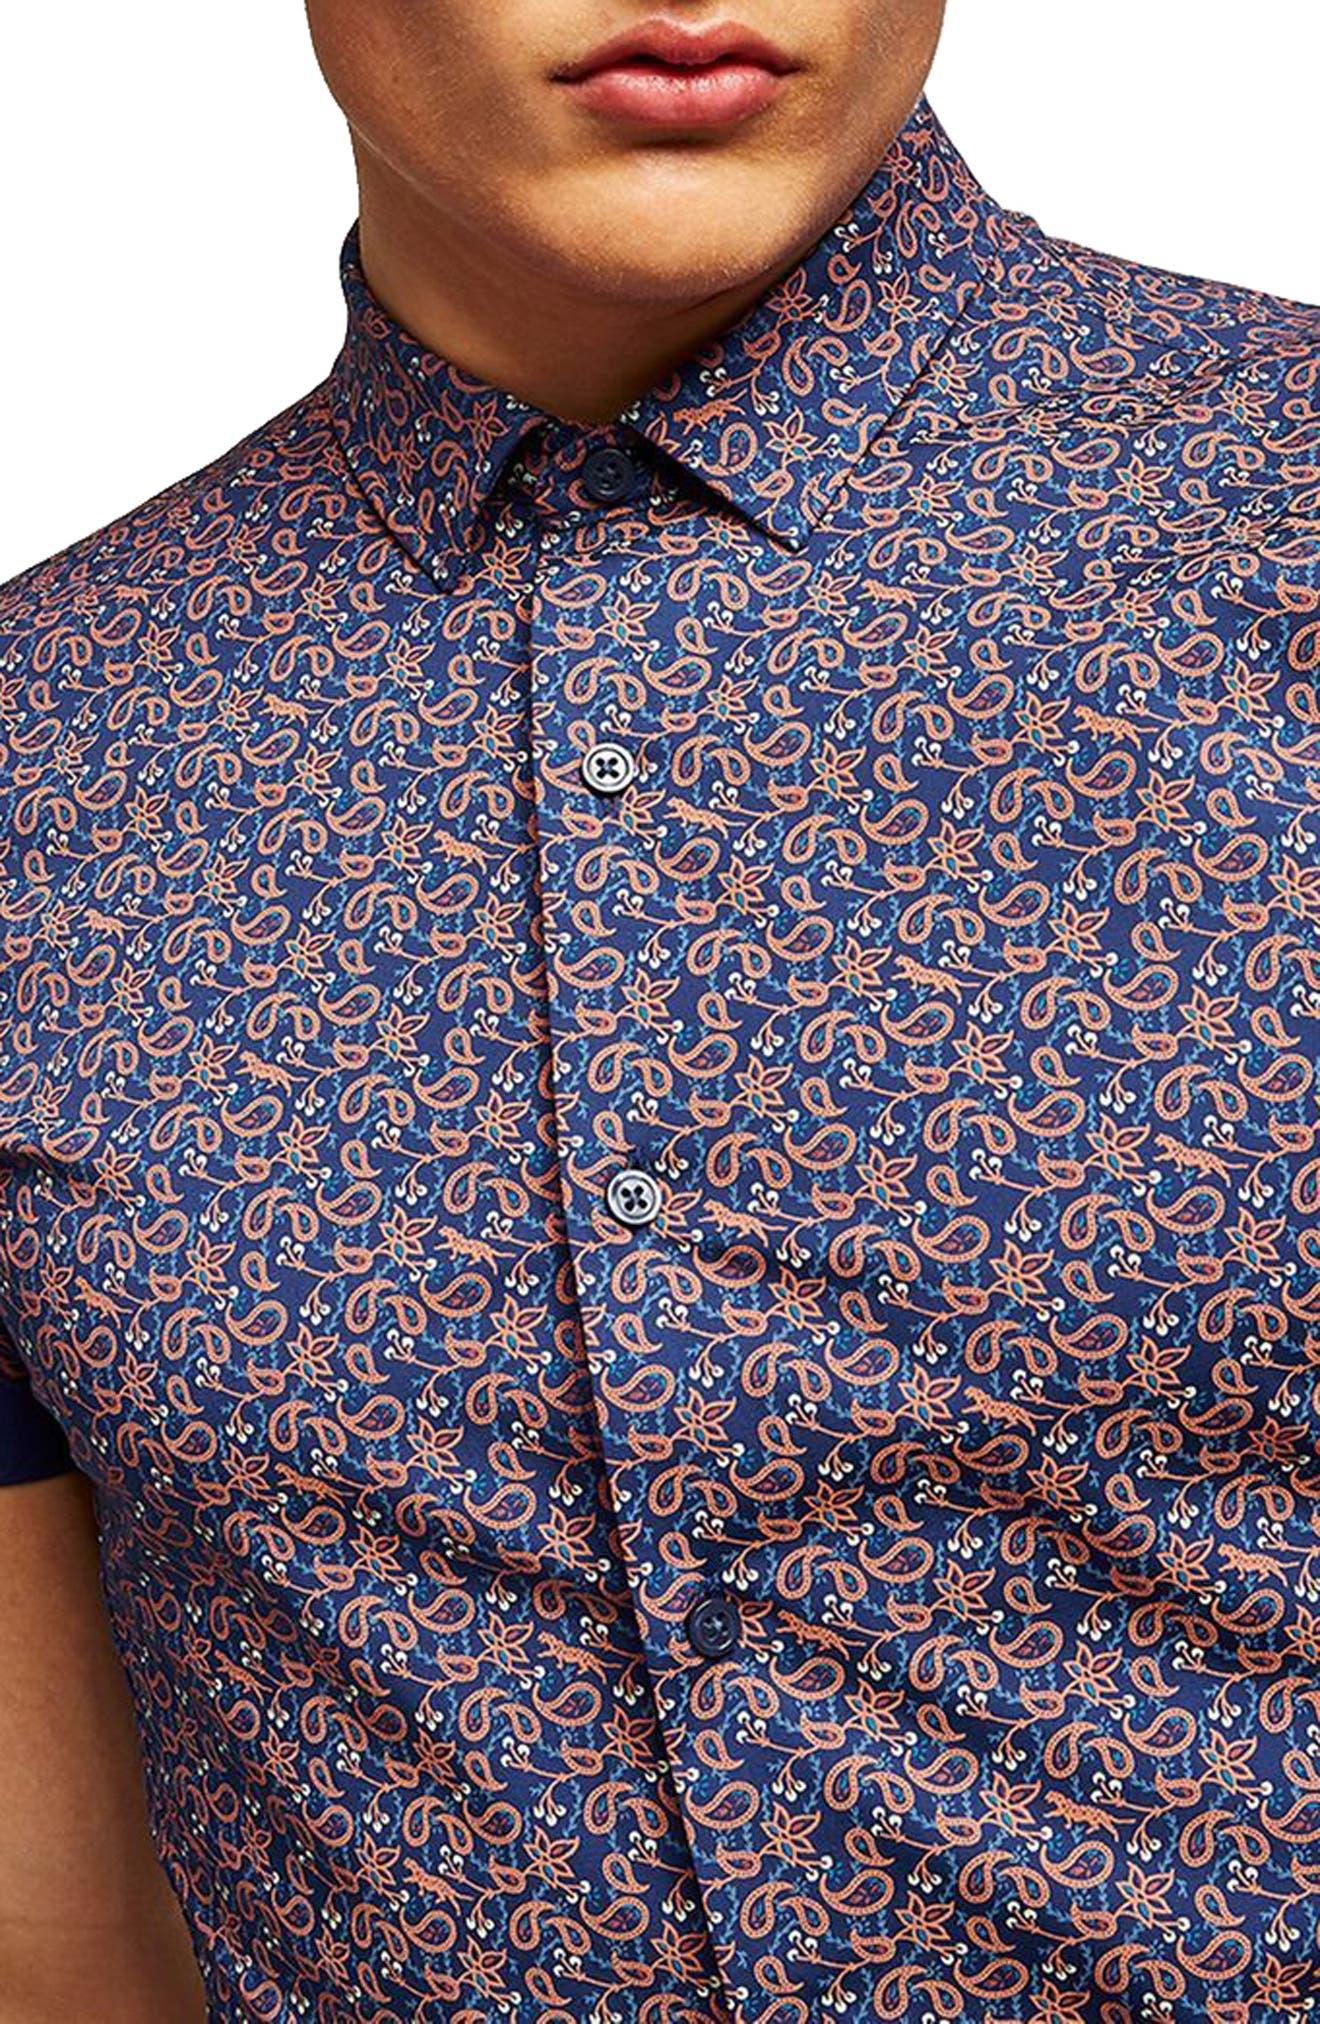 TOPMAN,                             Muscle Fit Eclectic Paisley Print Shirt,                             Alternate thumbnail 3, color,                             400